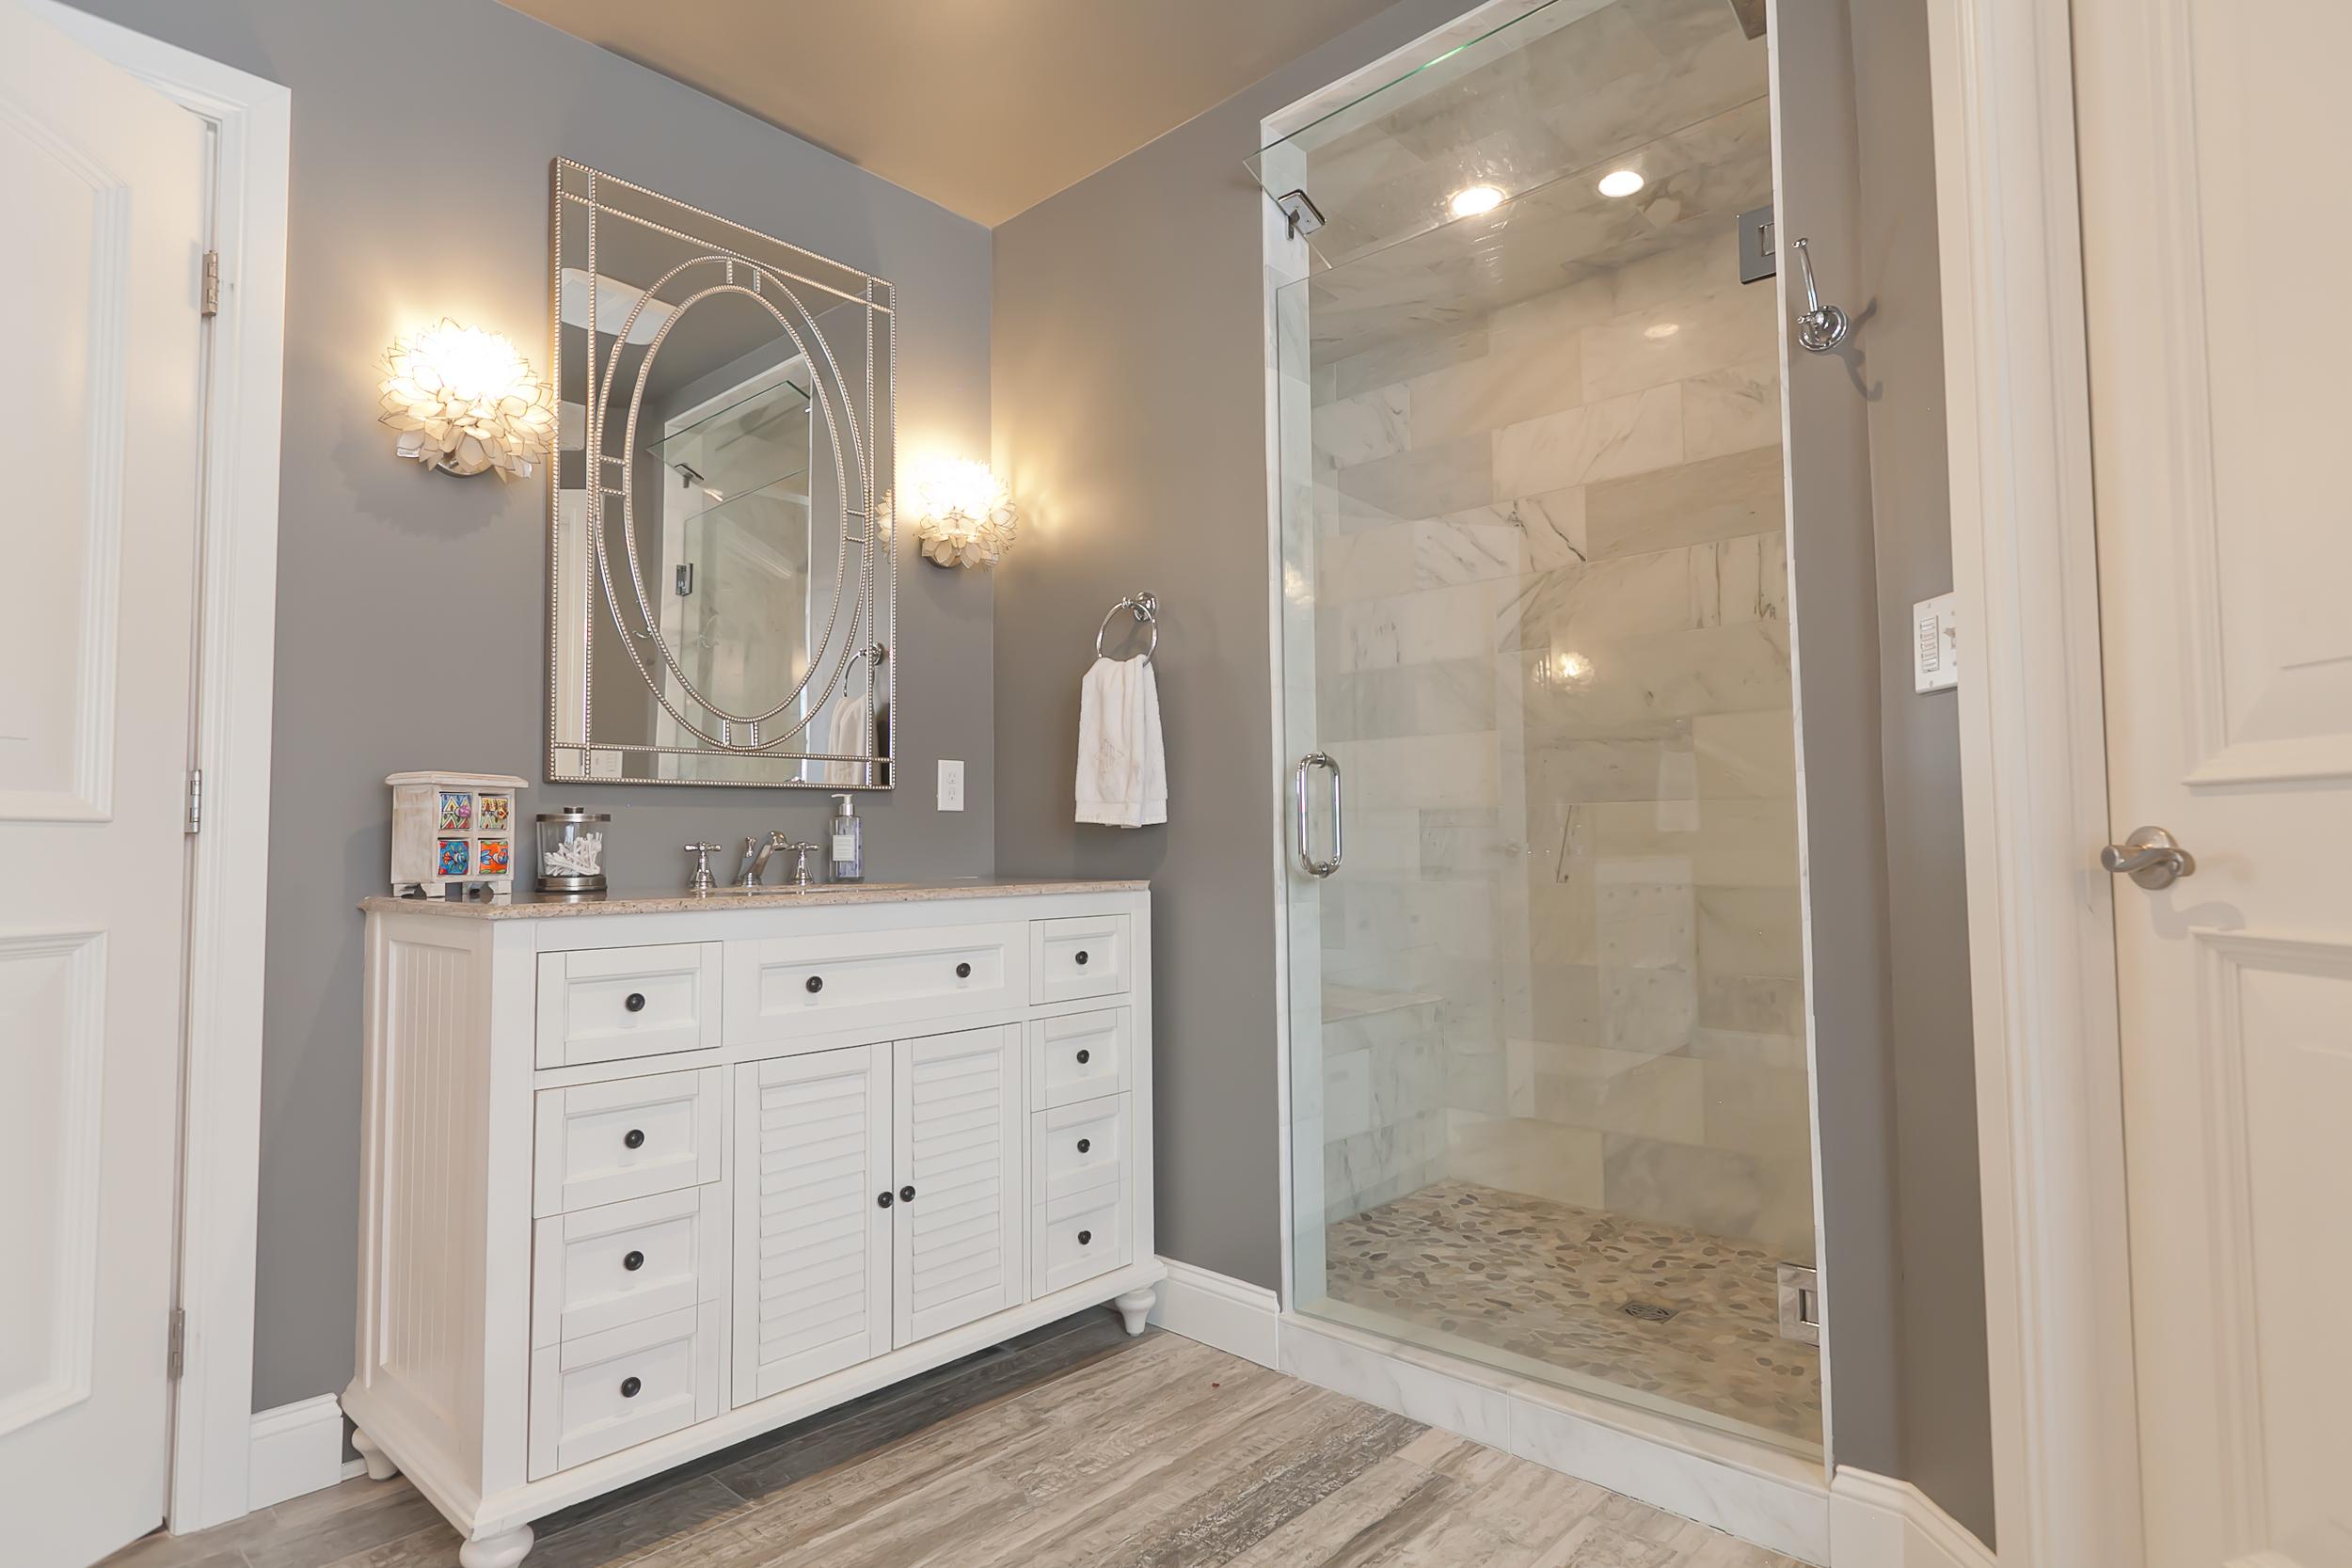 bathrooms 02.jpg